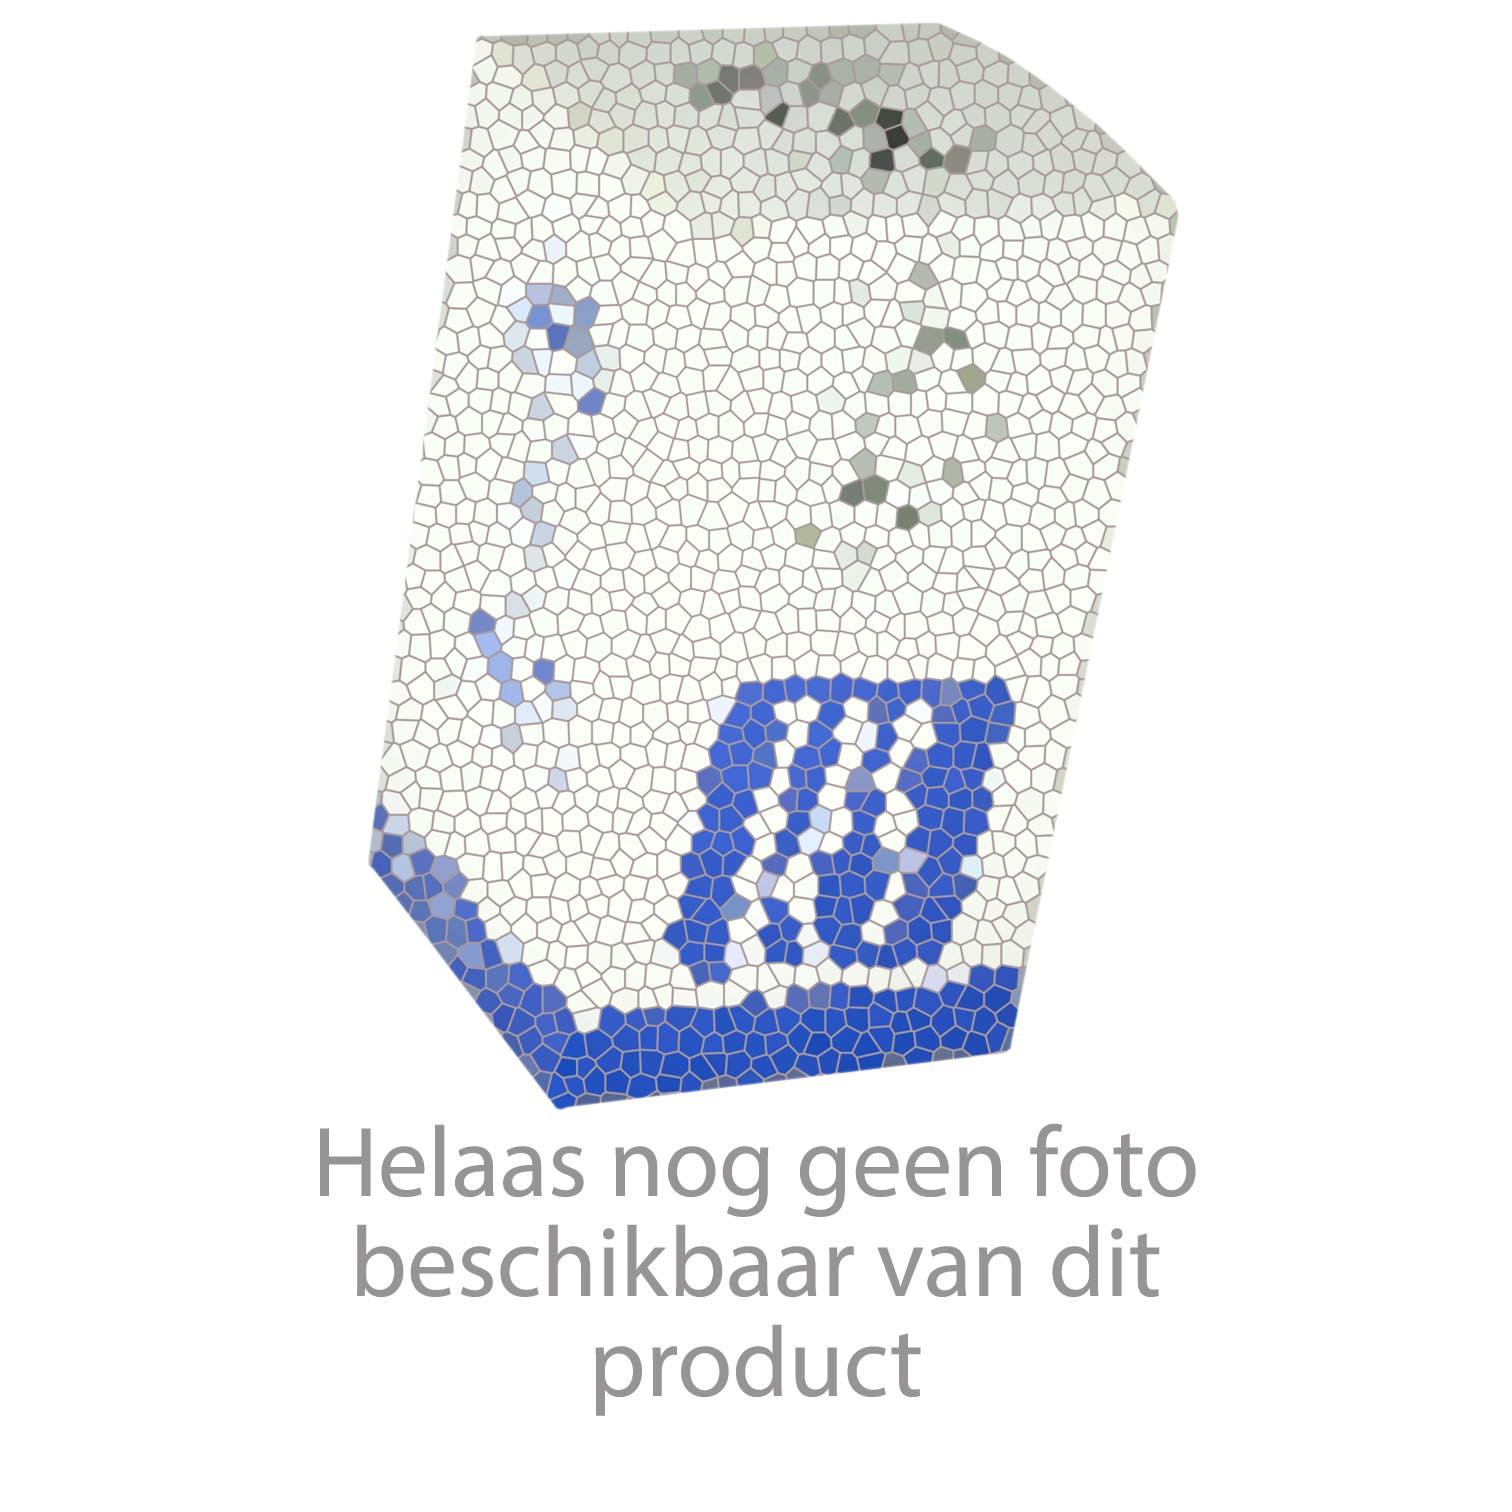 HansGrohe Keukenmengkranen Allegra Sportive / Allegra Talis'E productiejaar > 06/01 32812000 onderdelen